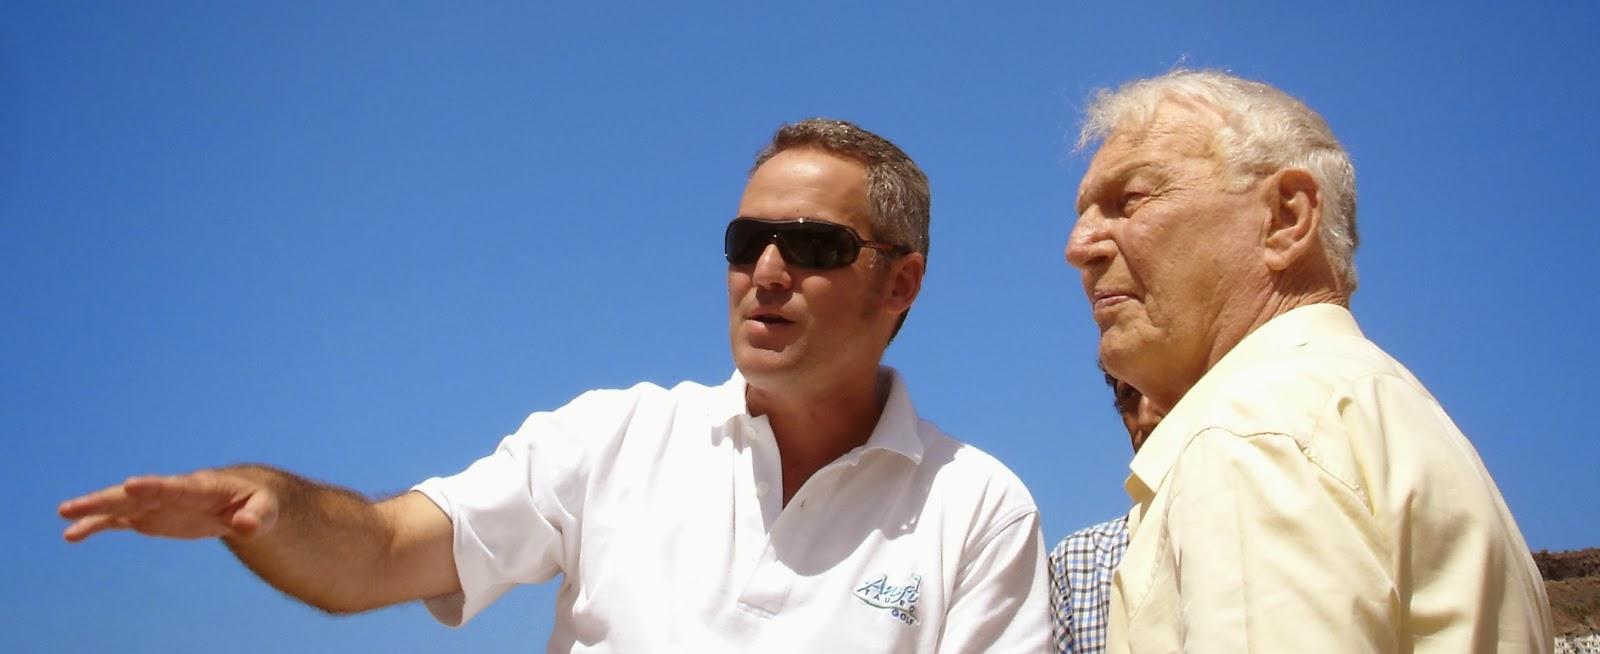 Richard a baril anfi tauro golf course - Javier suarez ...